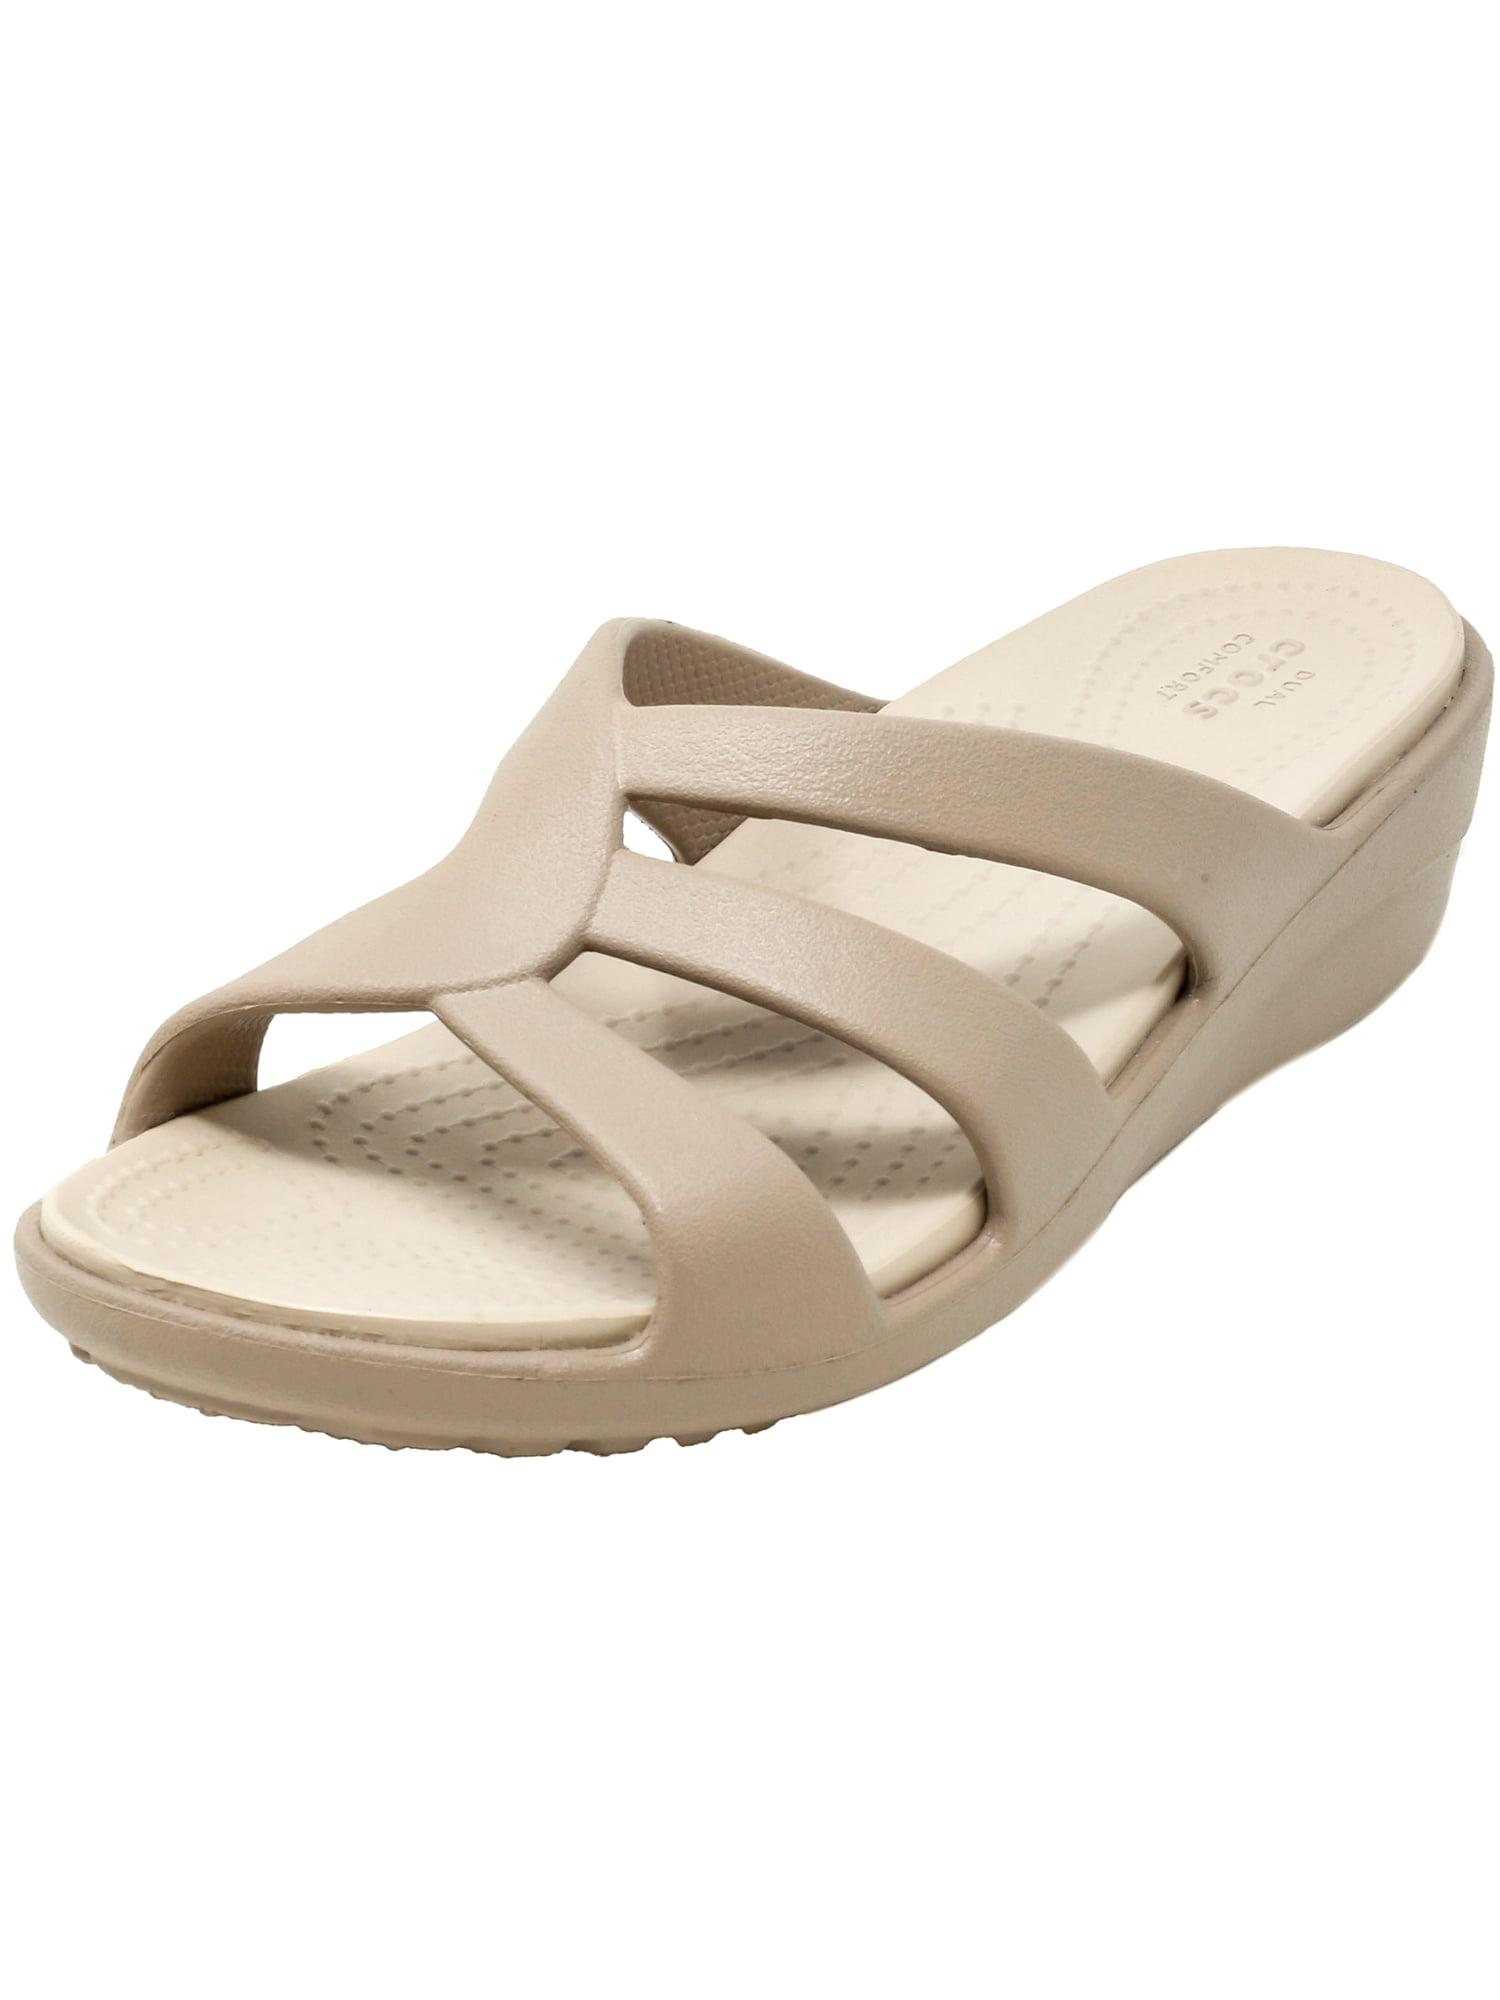 035e18b32943 Crocs womens sanrah strappy wedge mushroom cobblestone jpg 1500x2000 Crocs  sanrah